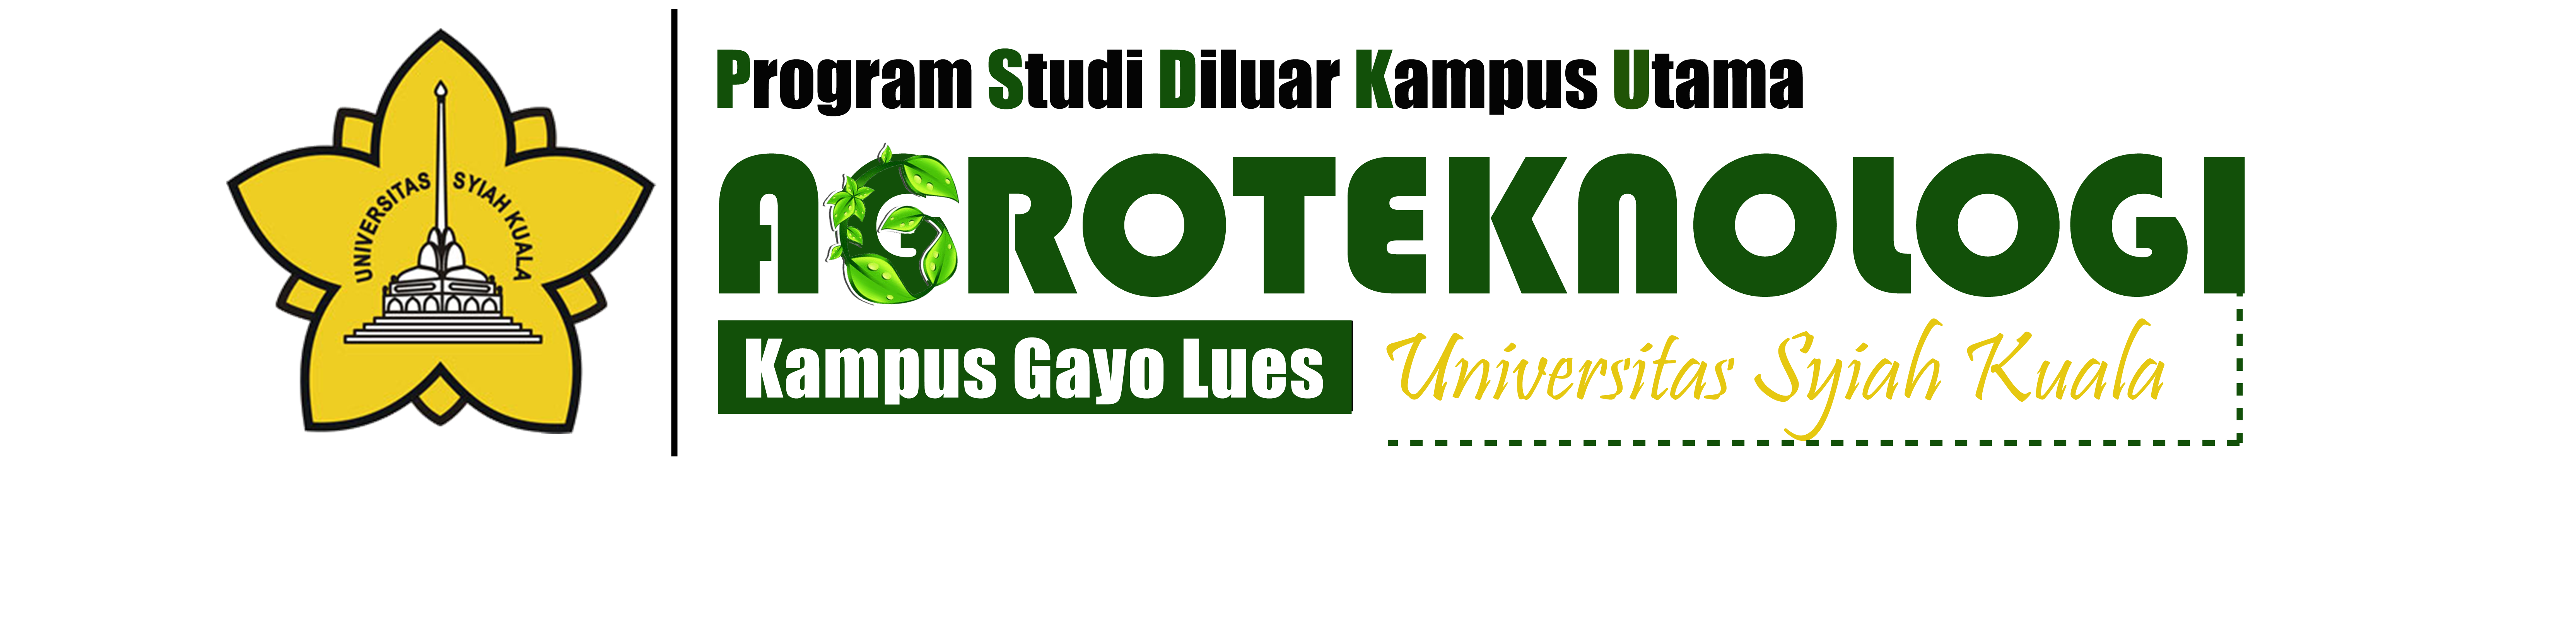 Program Studi Agroteknologi PSDKU-Gayo Lues